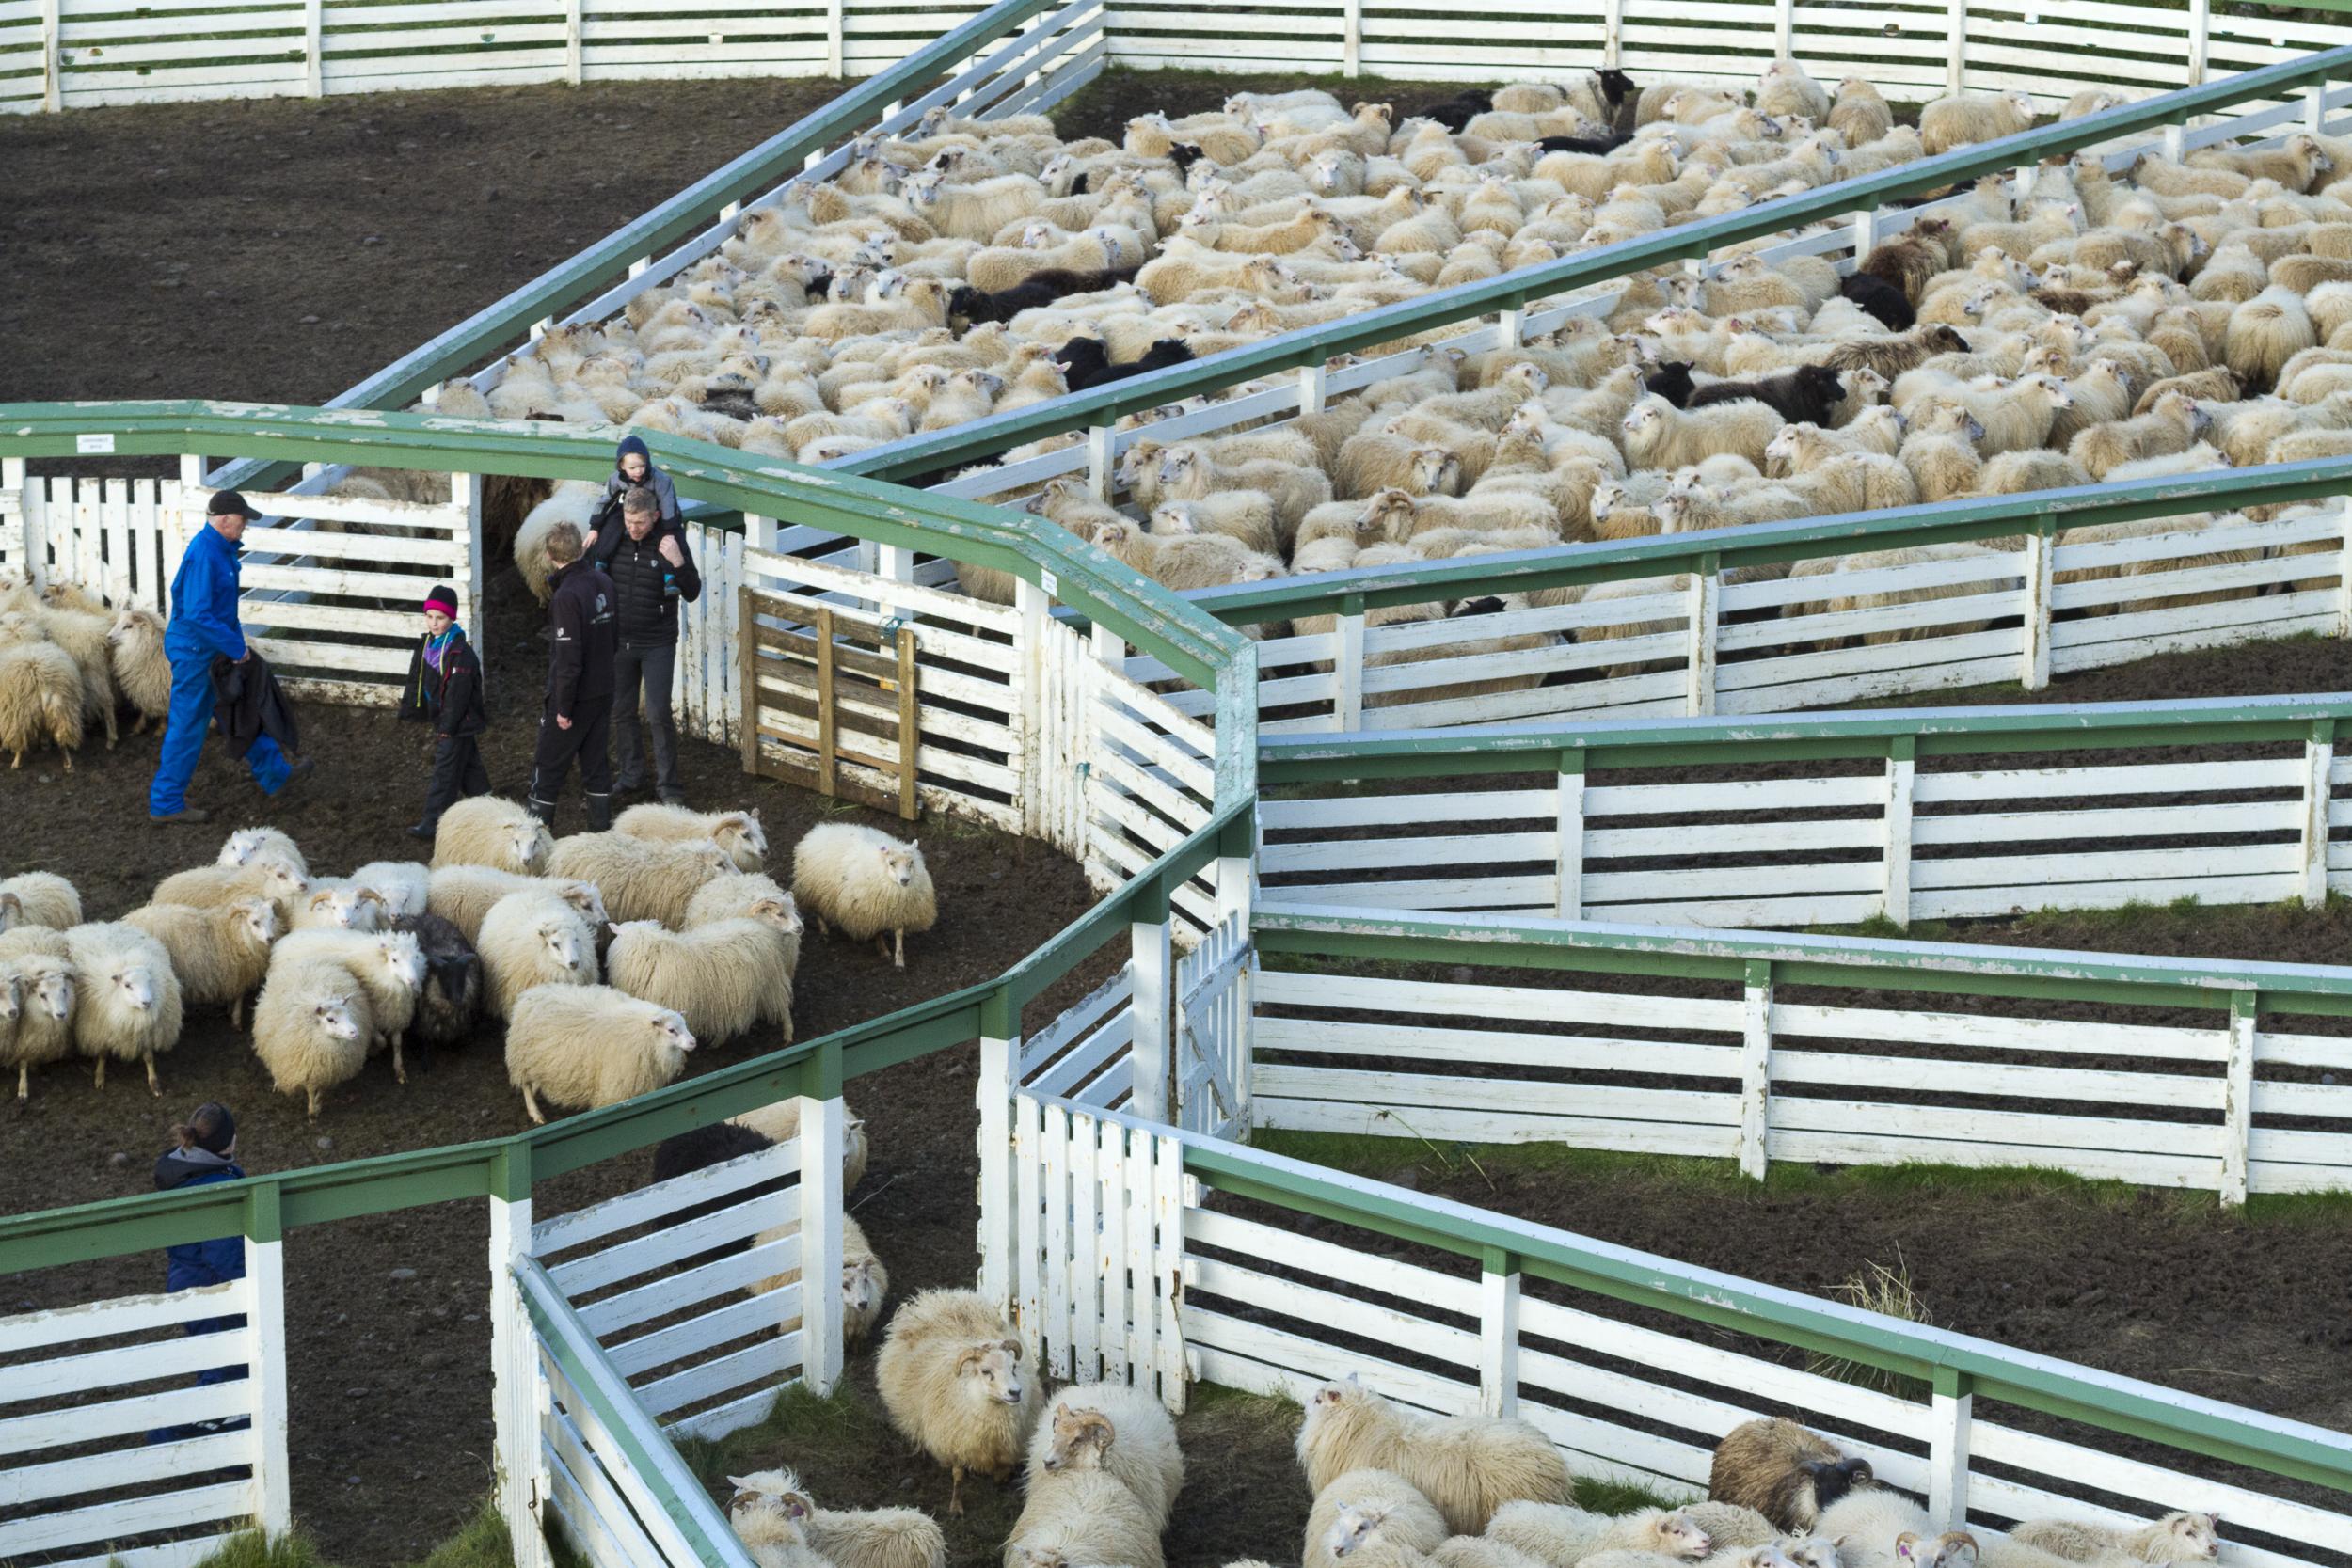 Sheep_019